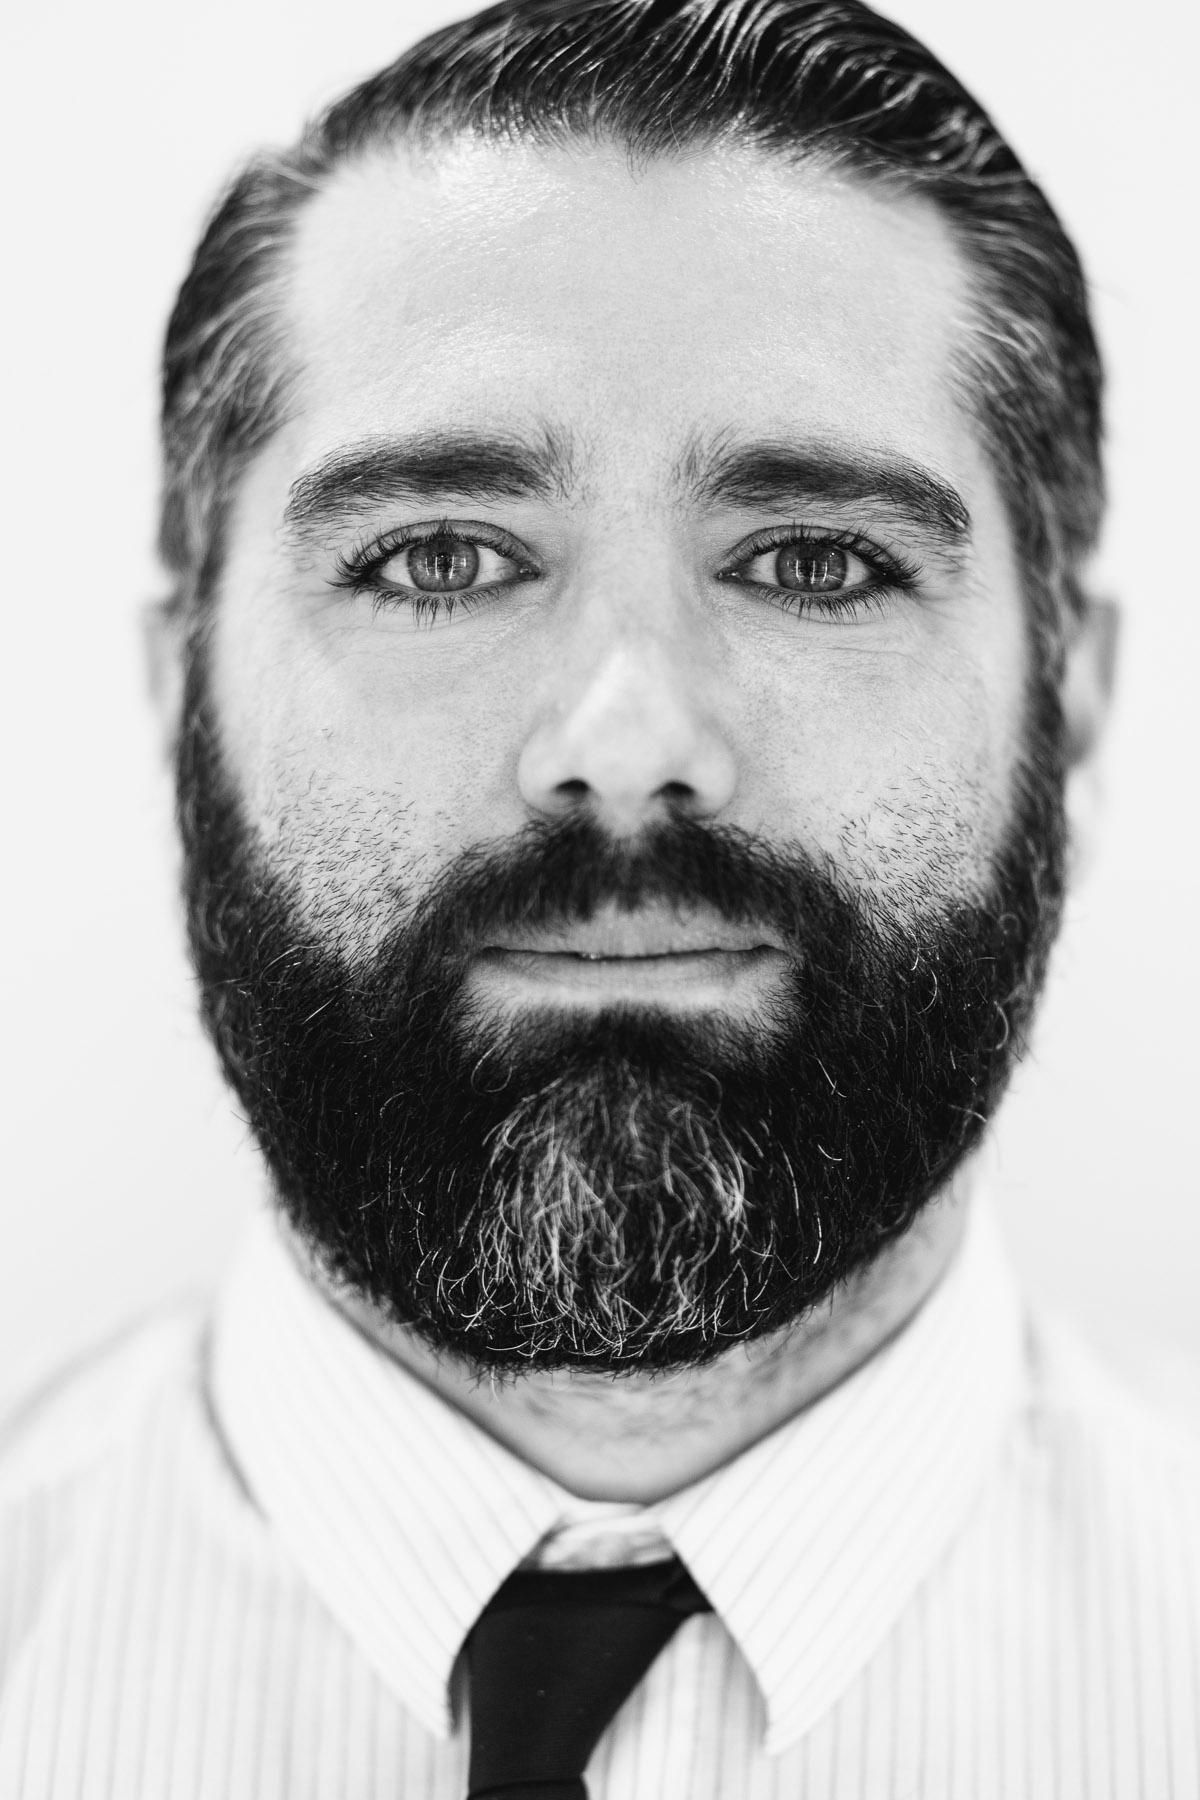 closeup-portrait-beard-blackandwhite.jpgcloseup-portrait-beard-blackandwhite.jpeg